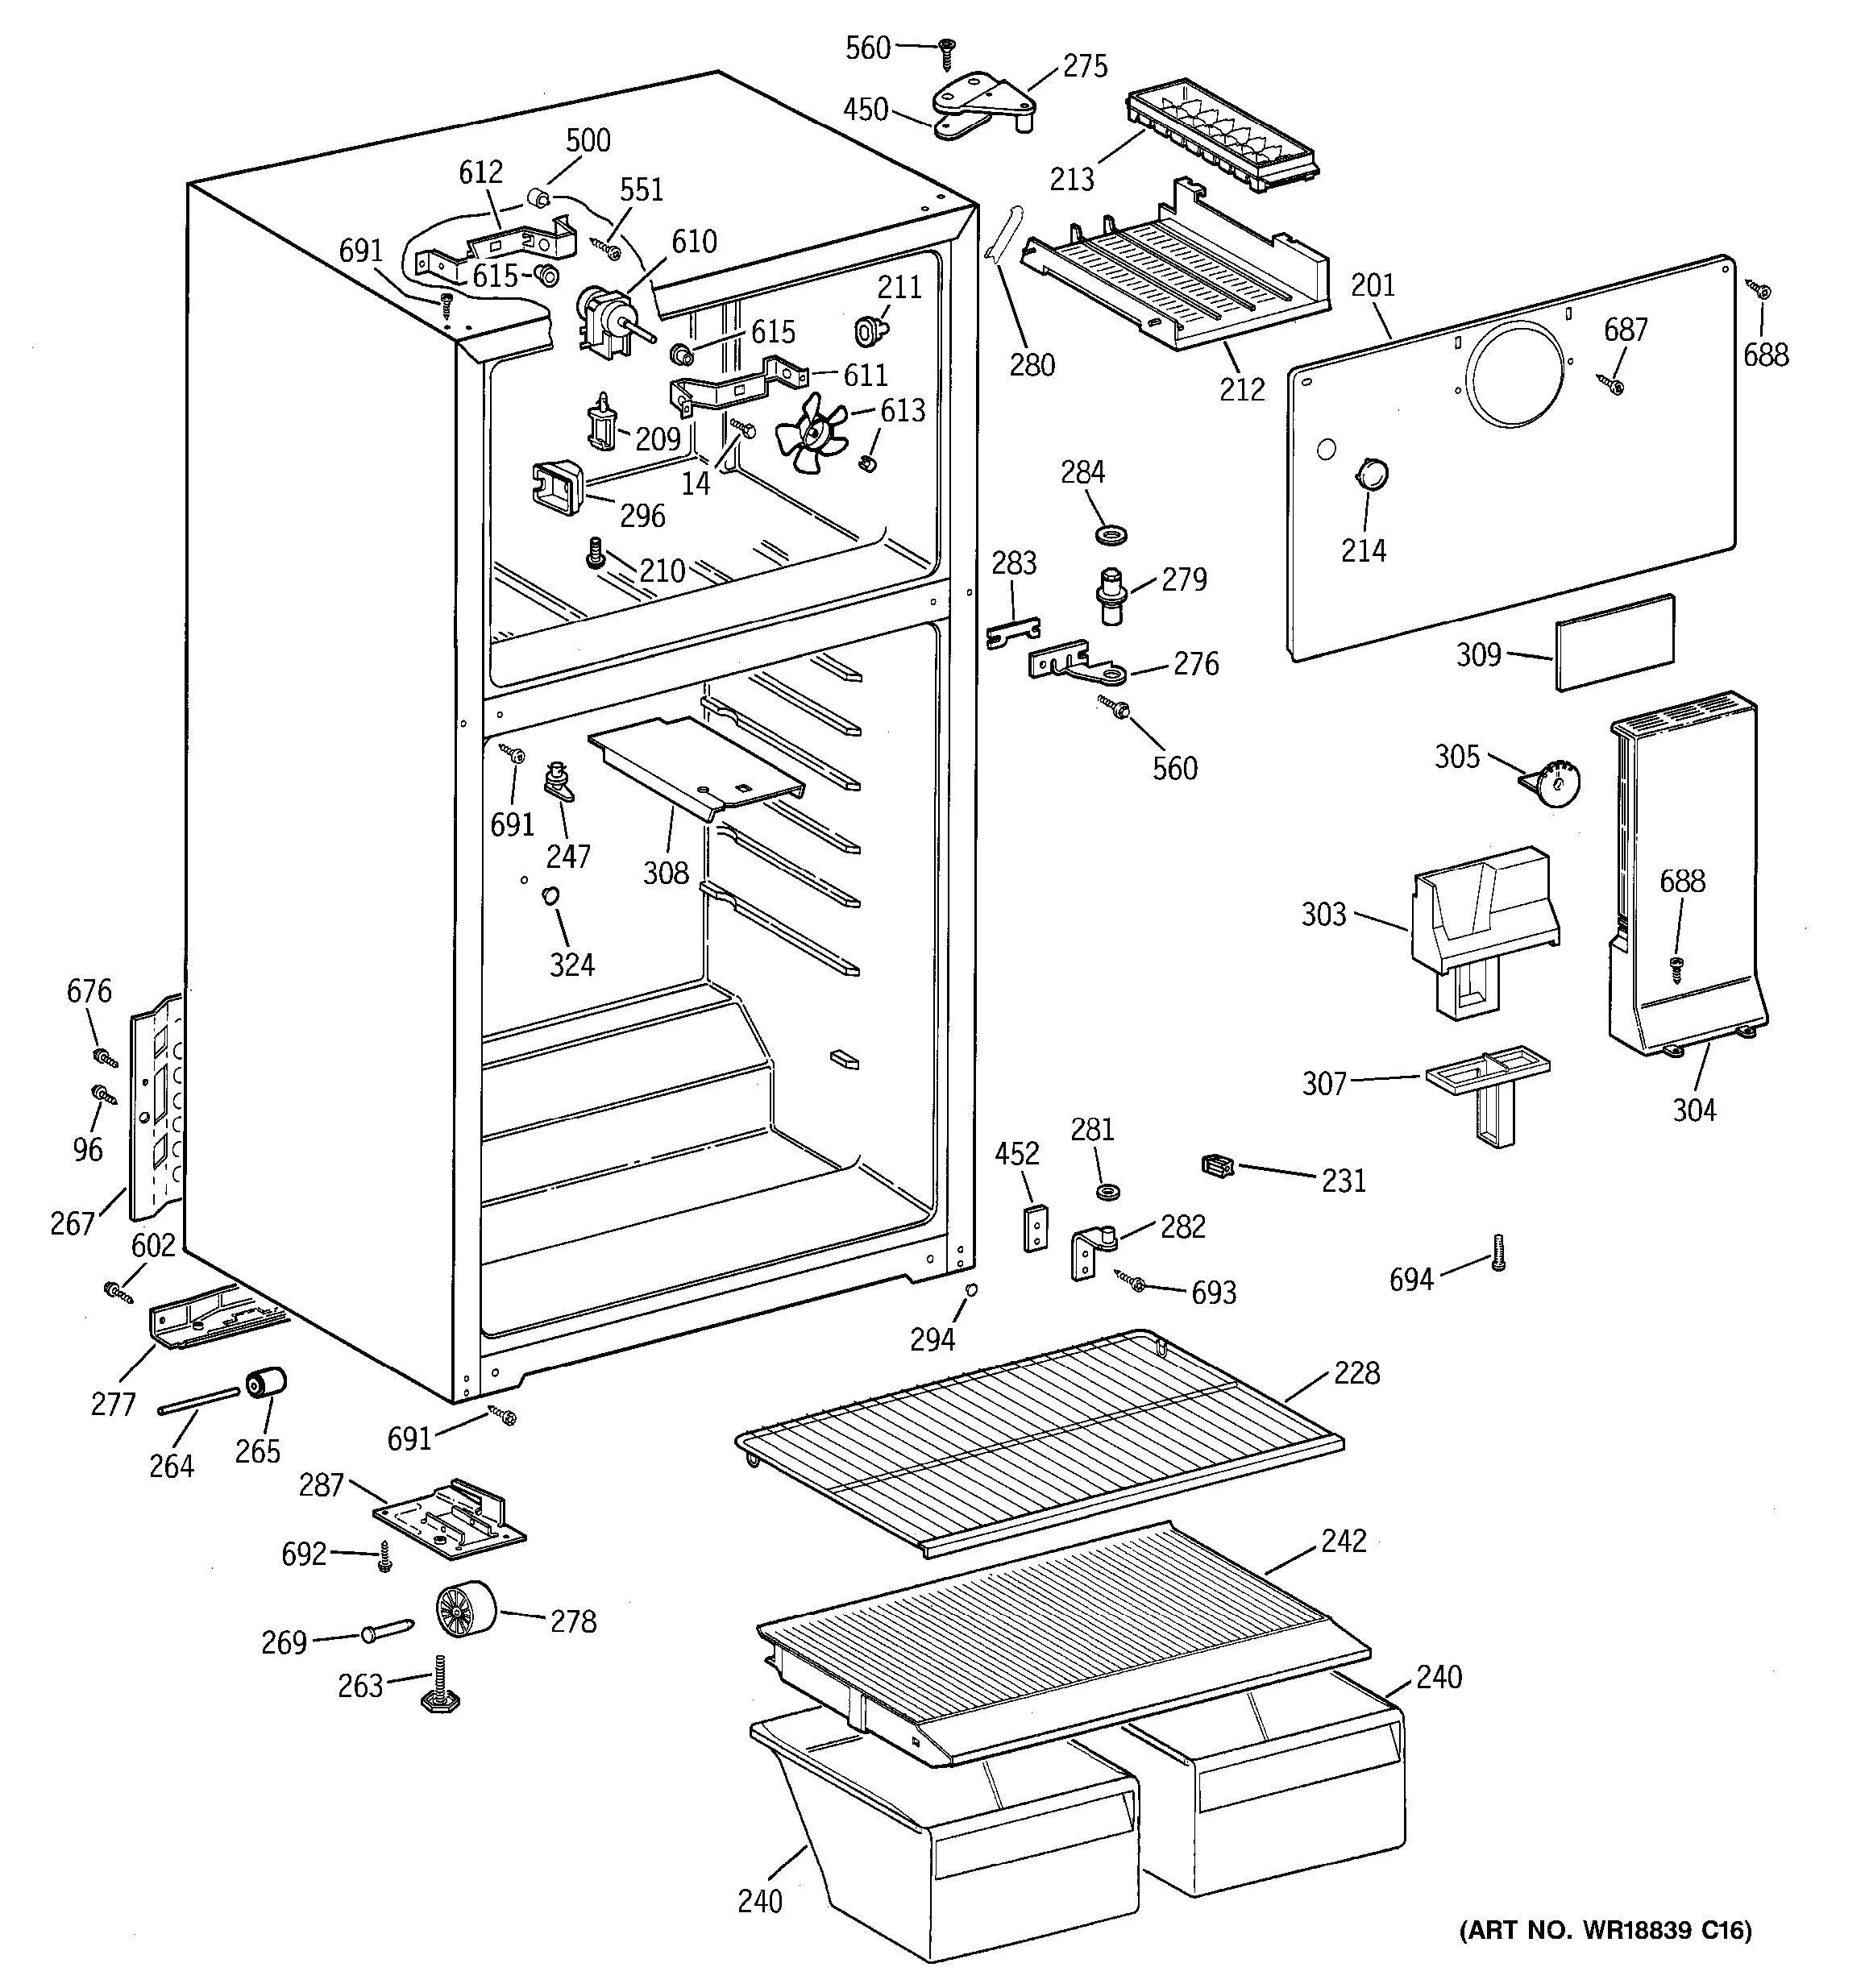 Jza80 Wiring Diagram Ge Tfx22r Refrigerator Wiring Diagram Wiring Diagram Database